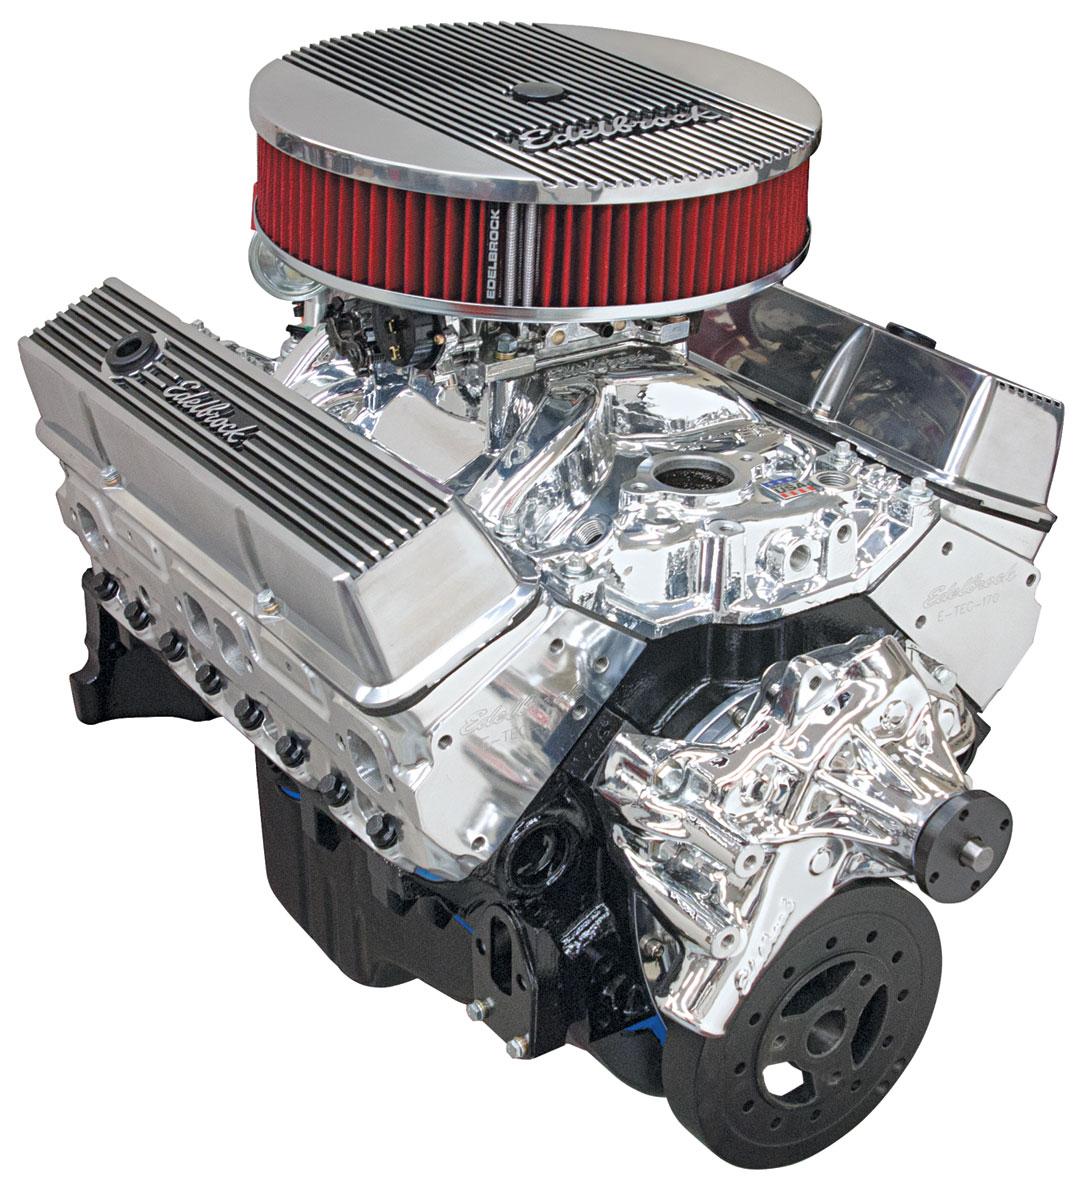 Photo of Crate Engine, Performer Hi-Torq, Edelbrock Long Water Pump EnduraShine